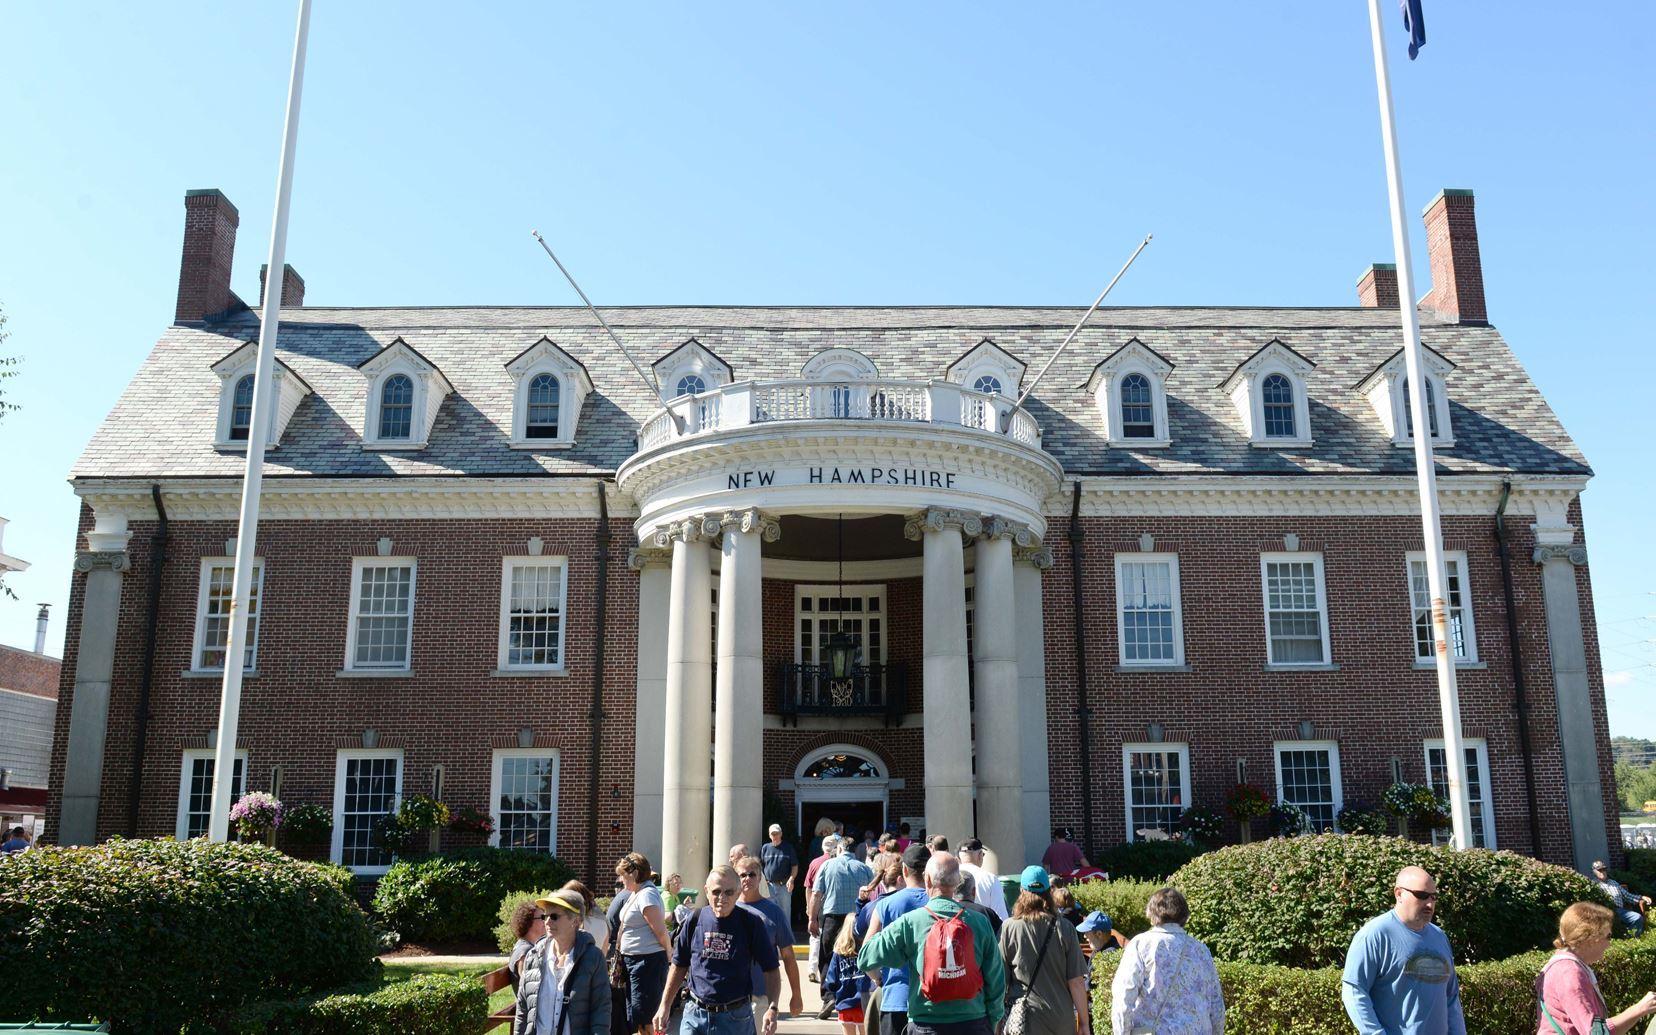 New Hampshire Building